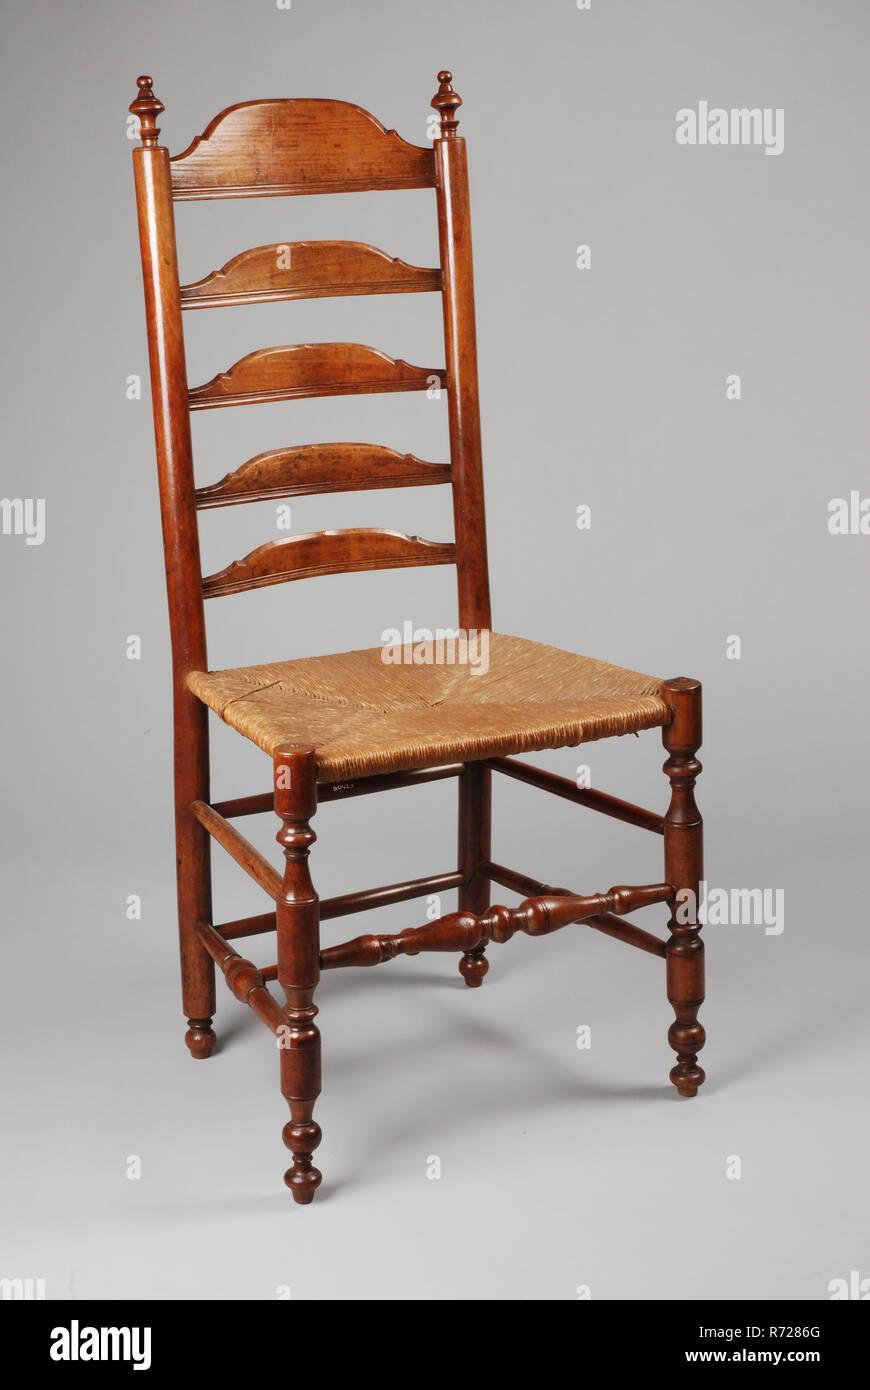 Kirschholz taste Stuhl, knopf Sitz Stuhl möbel Möbel ...